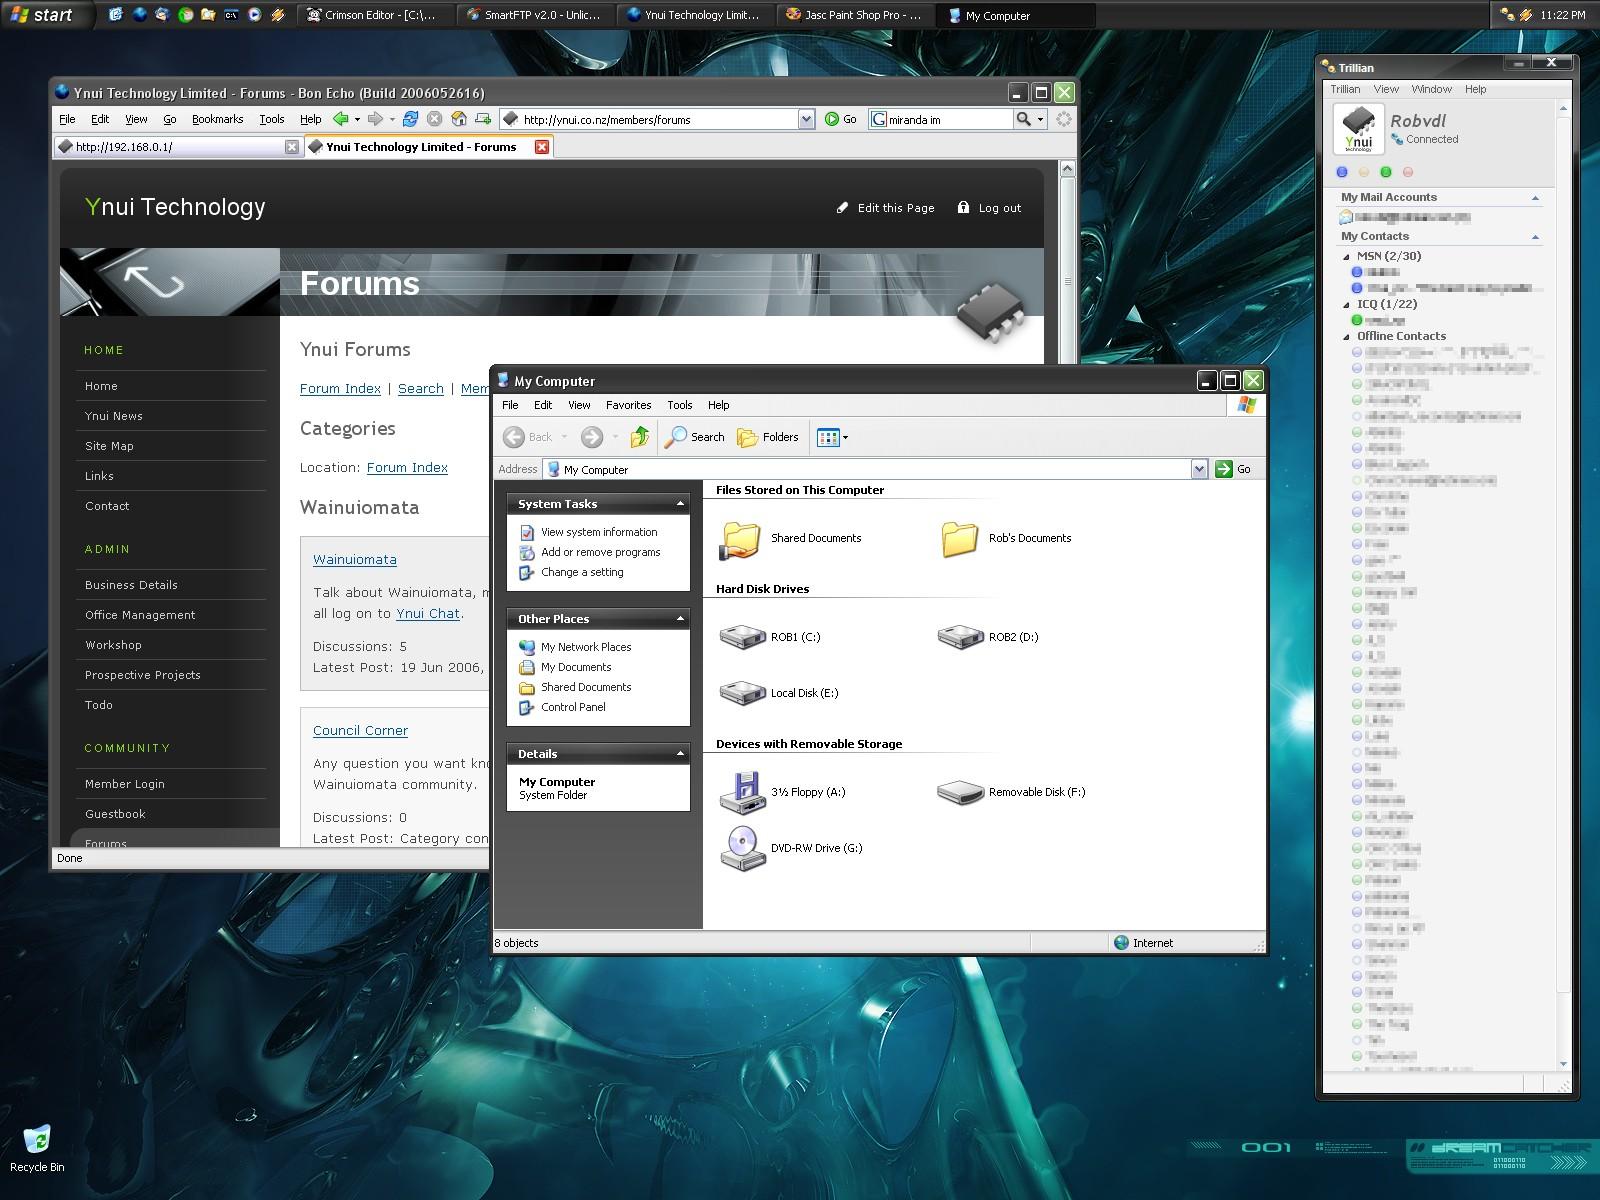 My current desktop 2